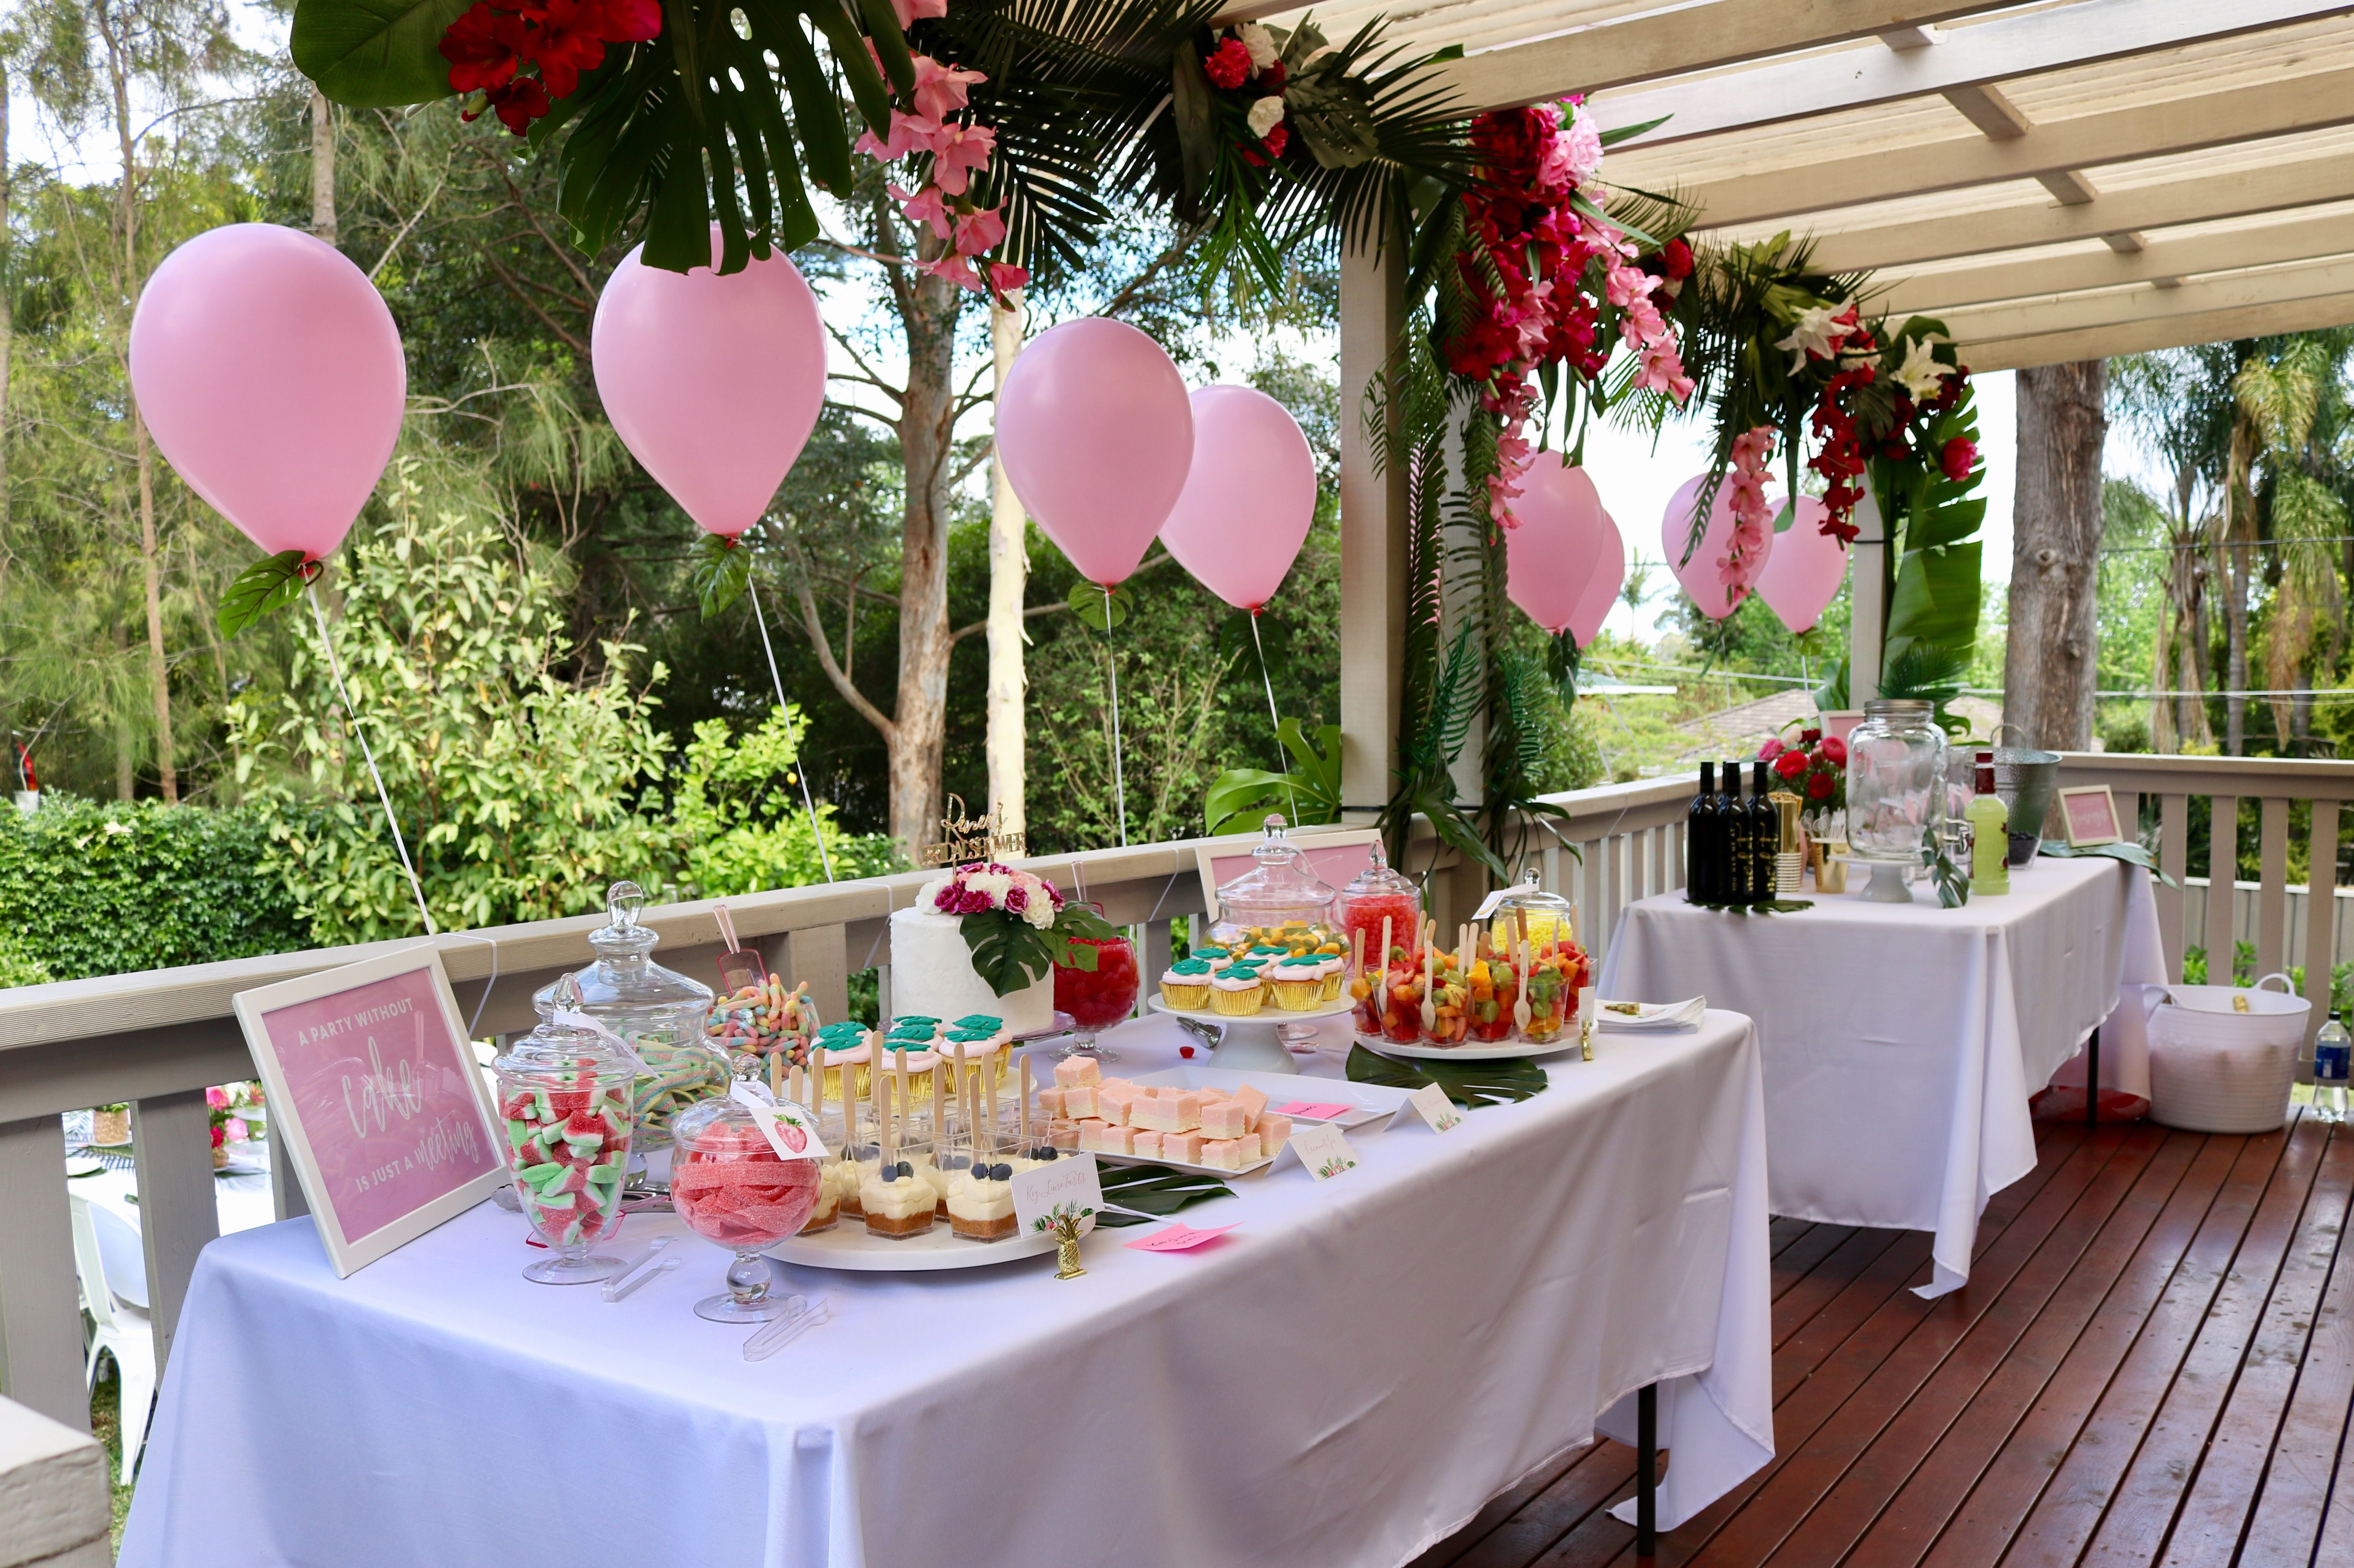 Tropical Bridal Shower Decor  Kitchen Tea Ideas  Pink Balloons